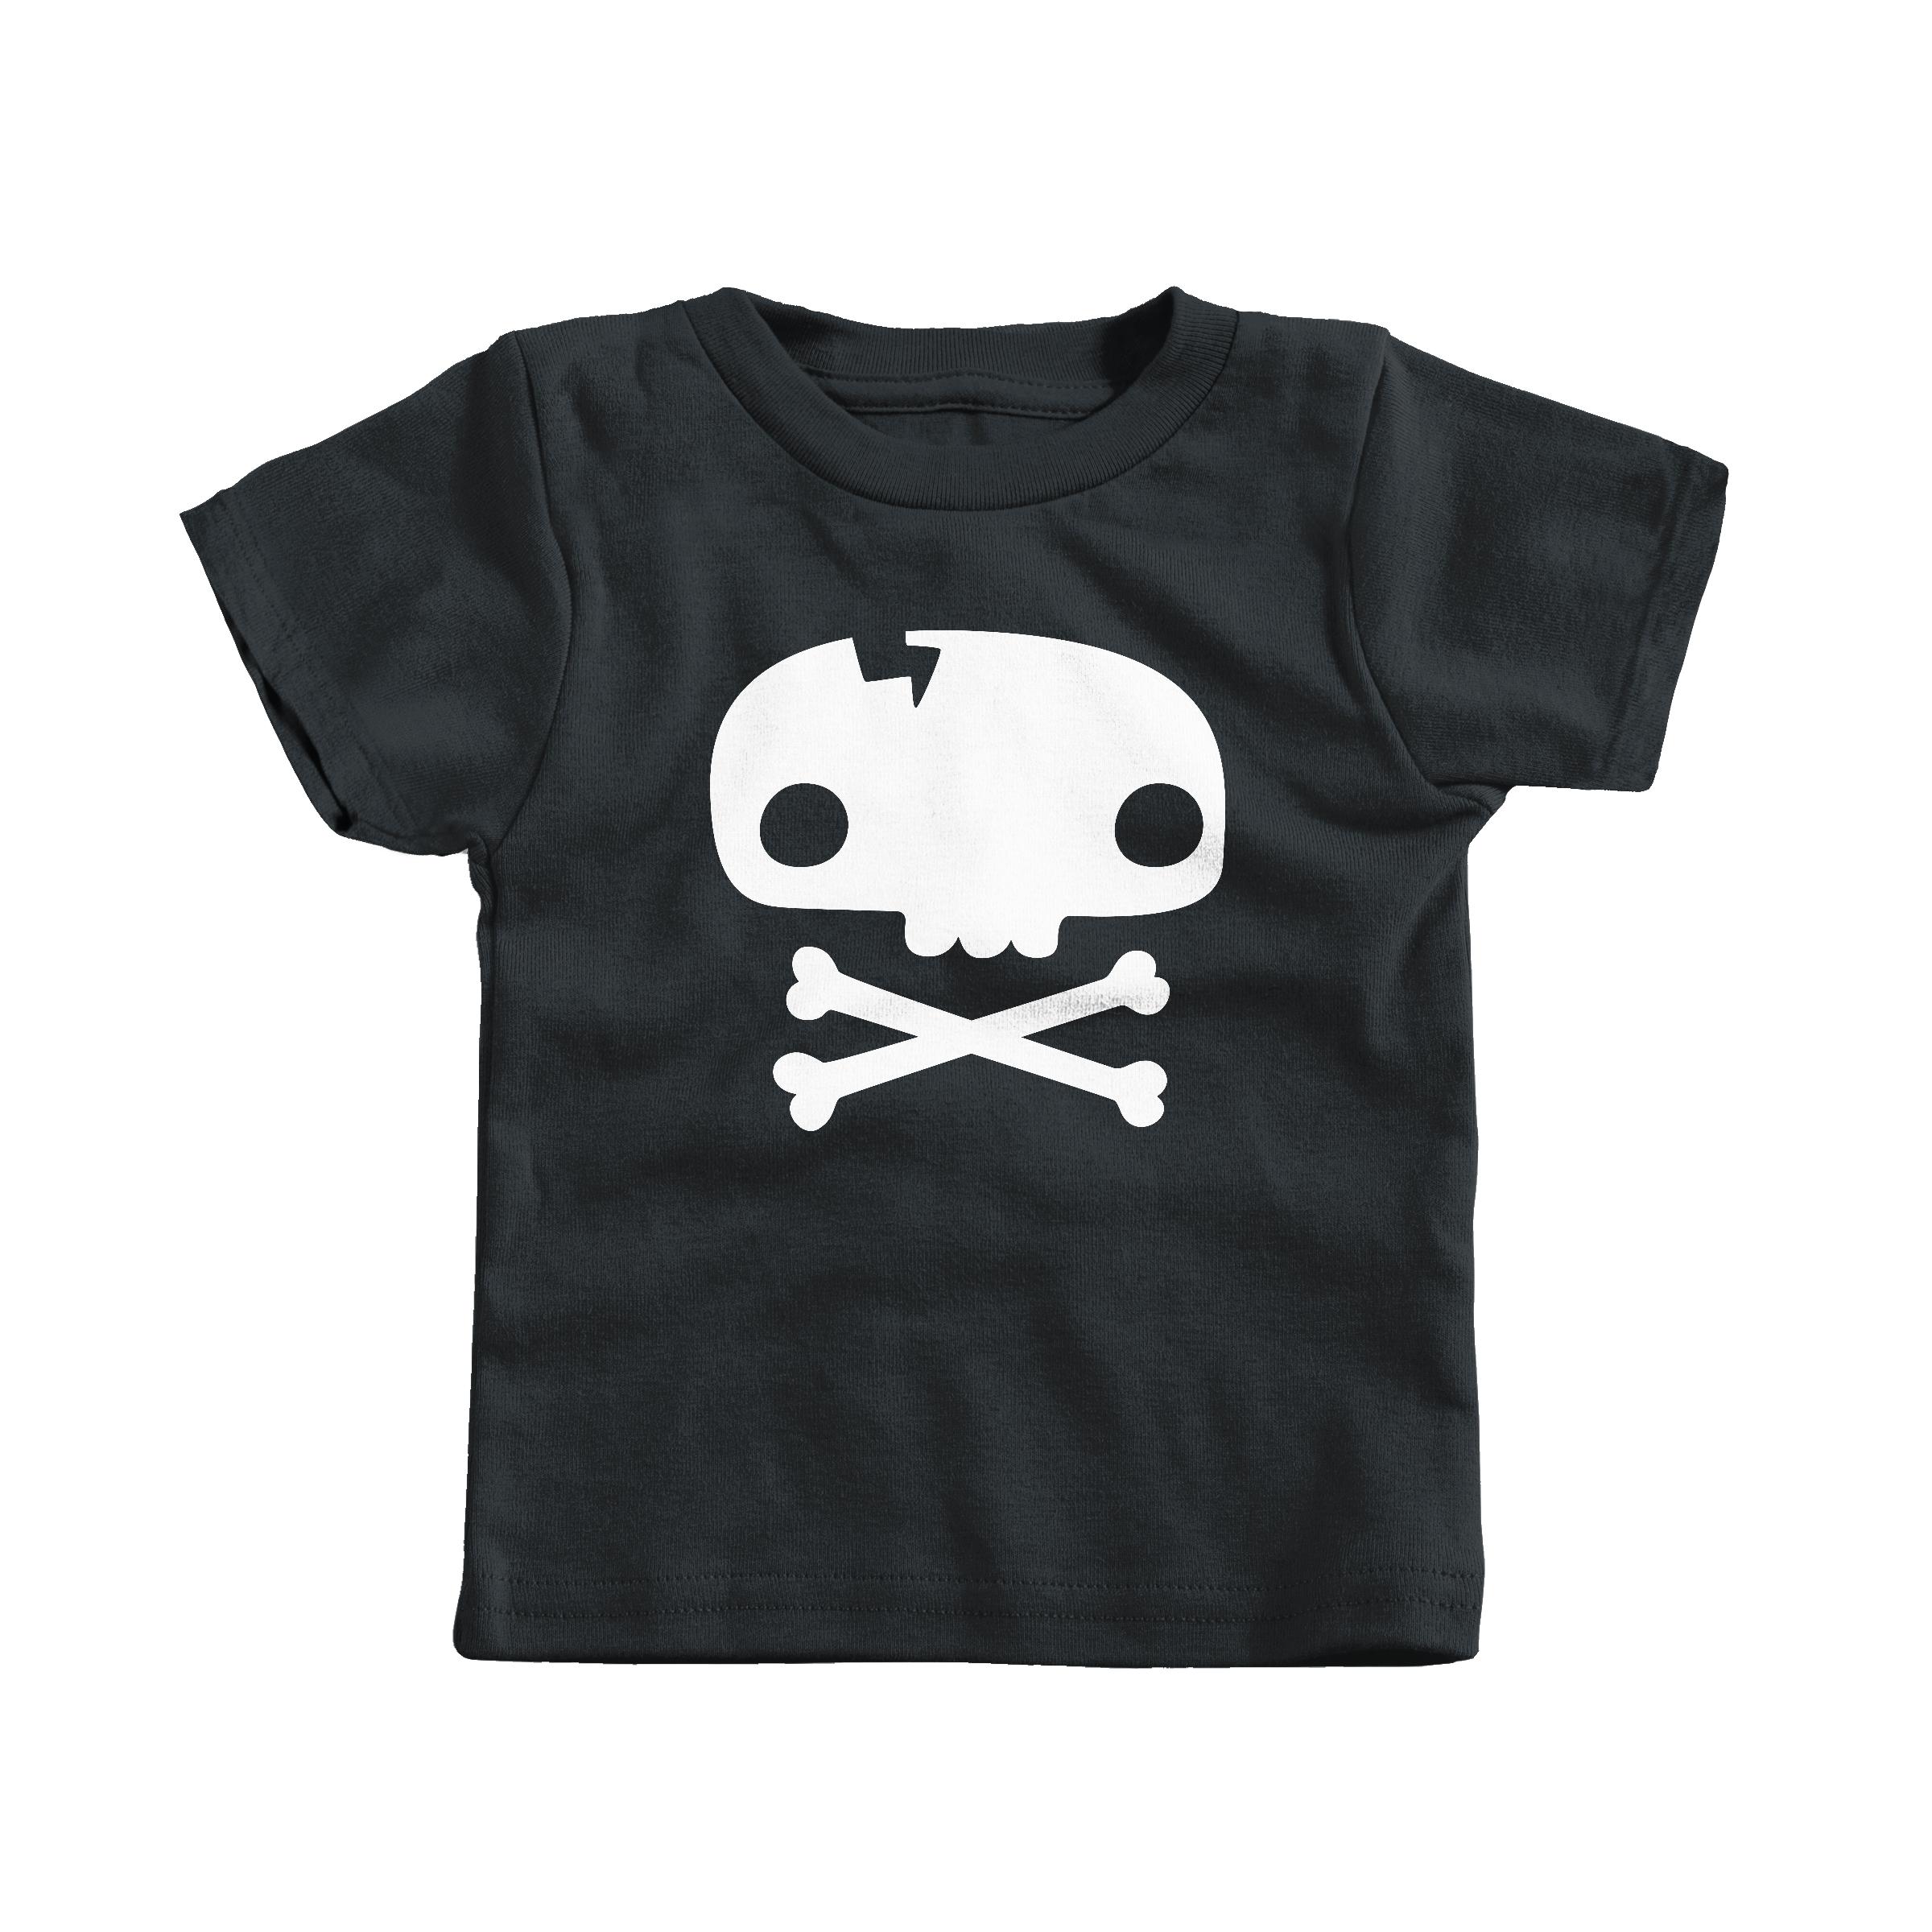 Skull Tee Black (T-Shirt)